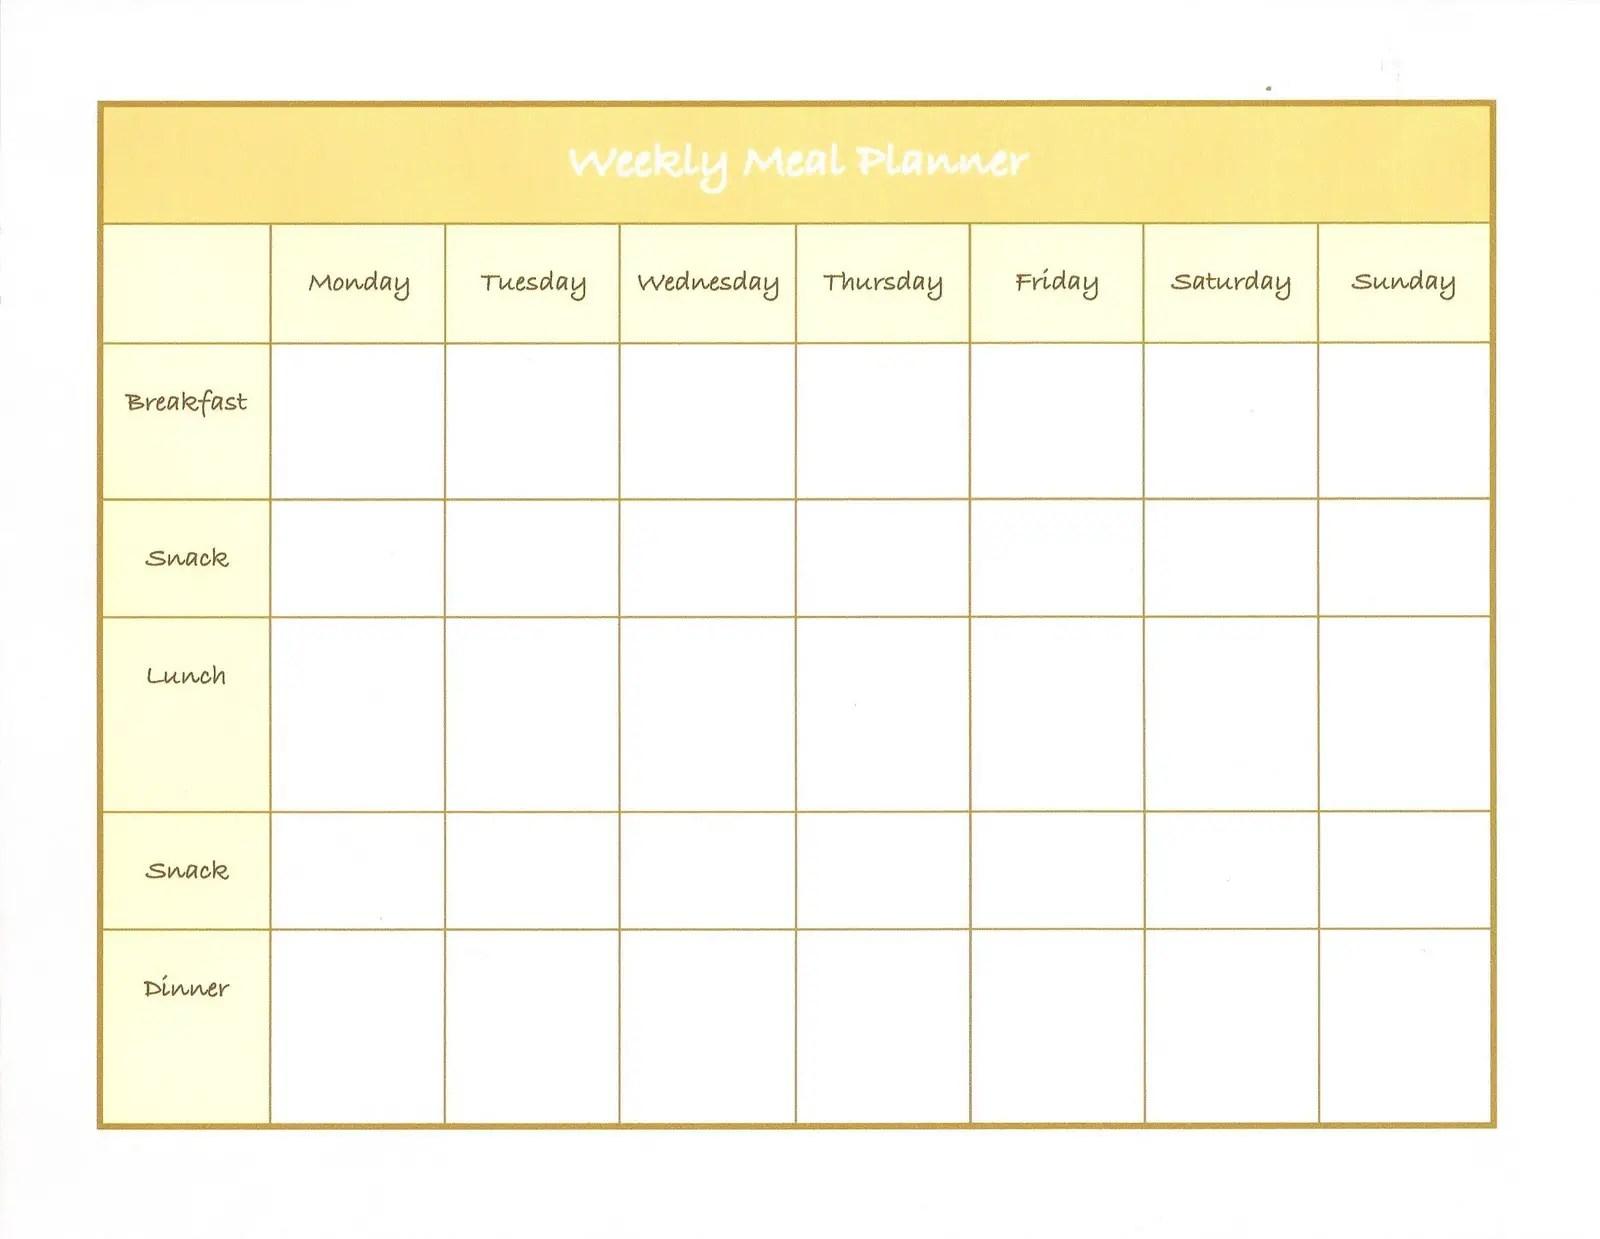 45 Printable Weekly Meal Planner Templates